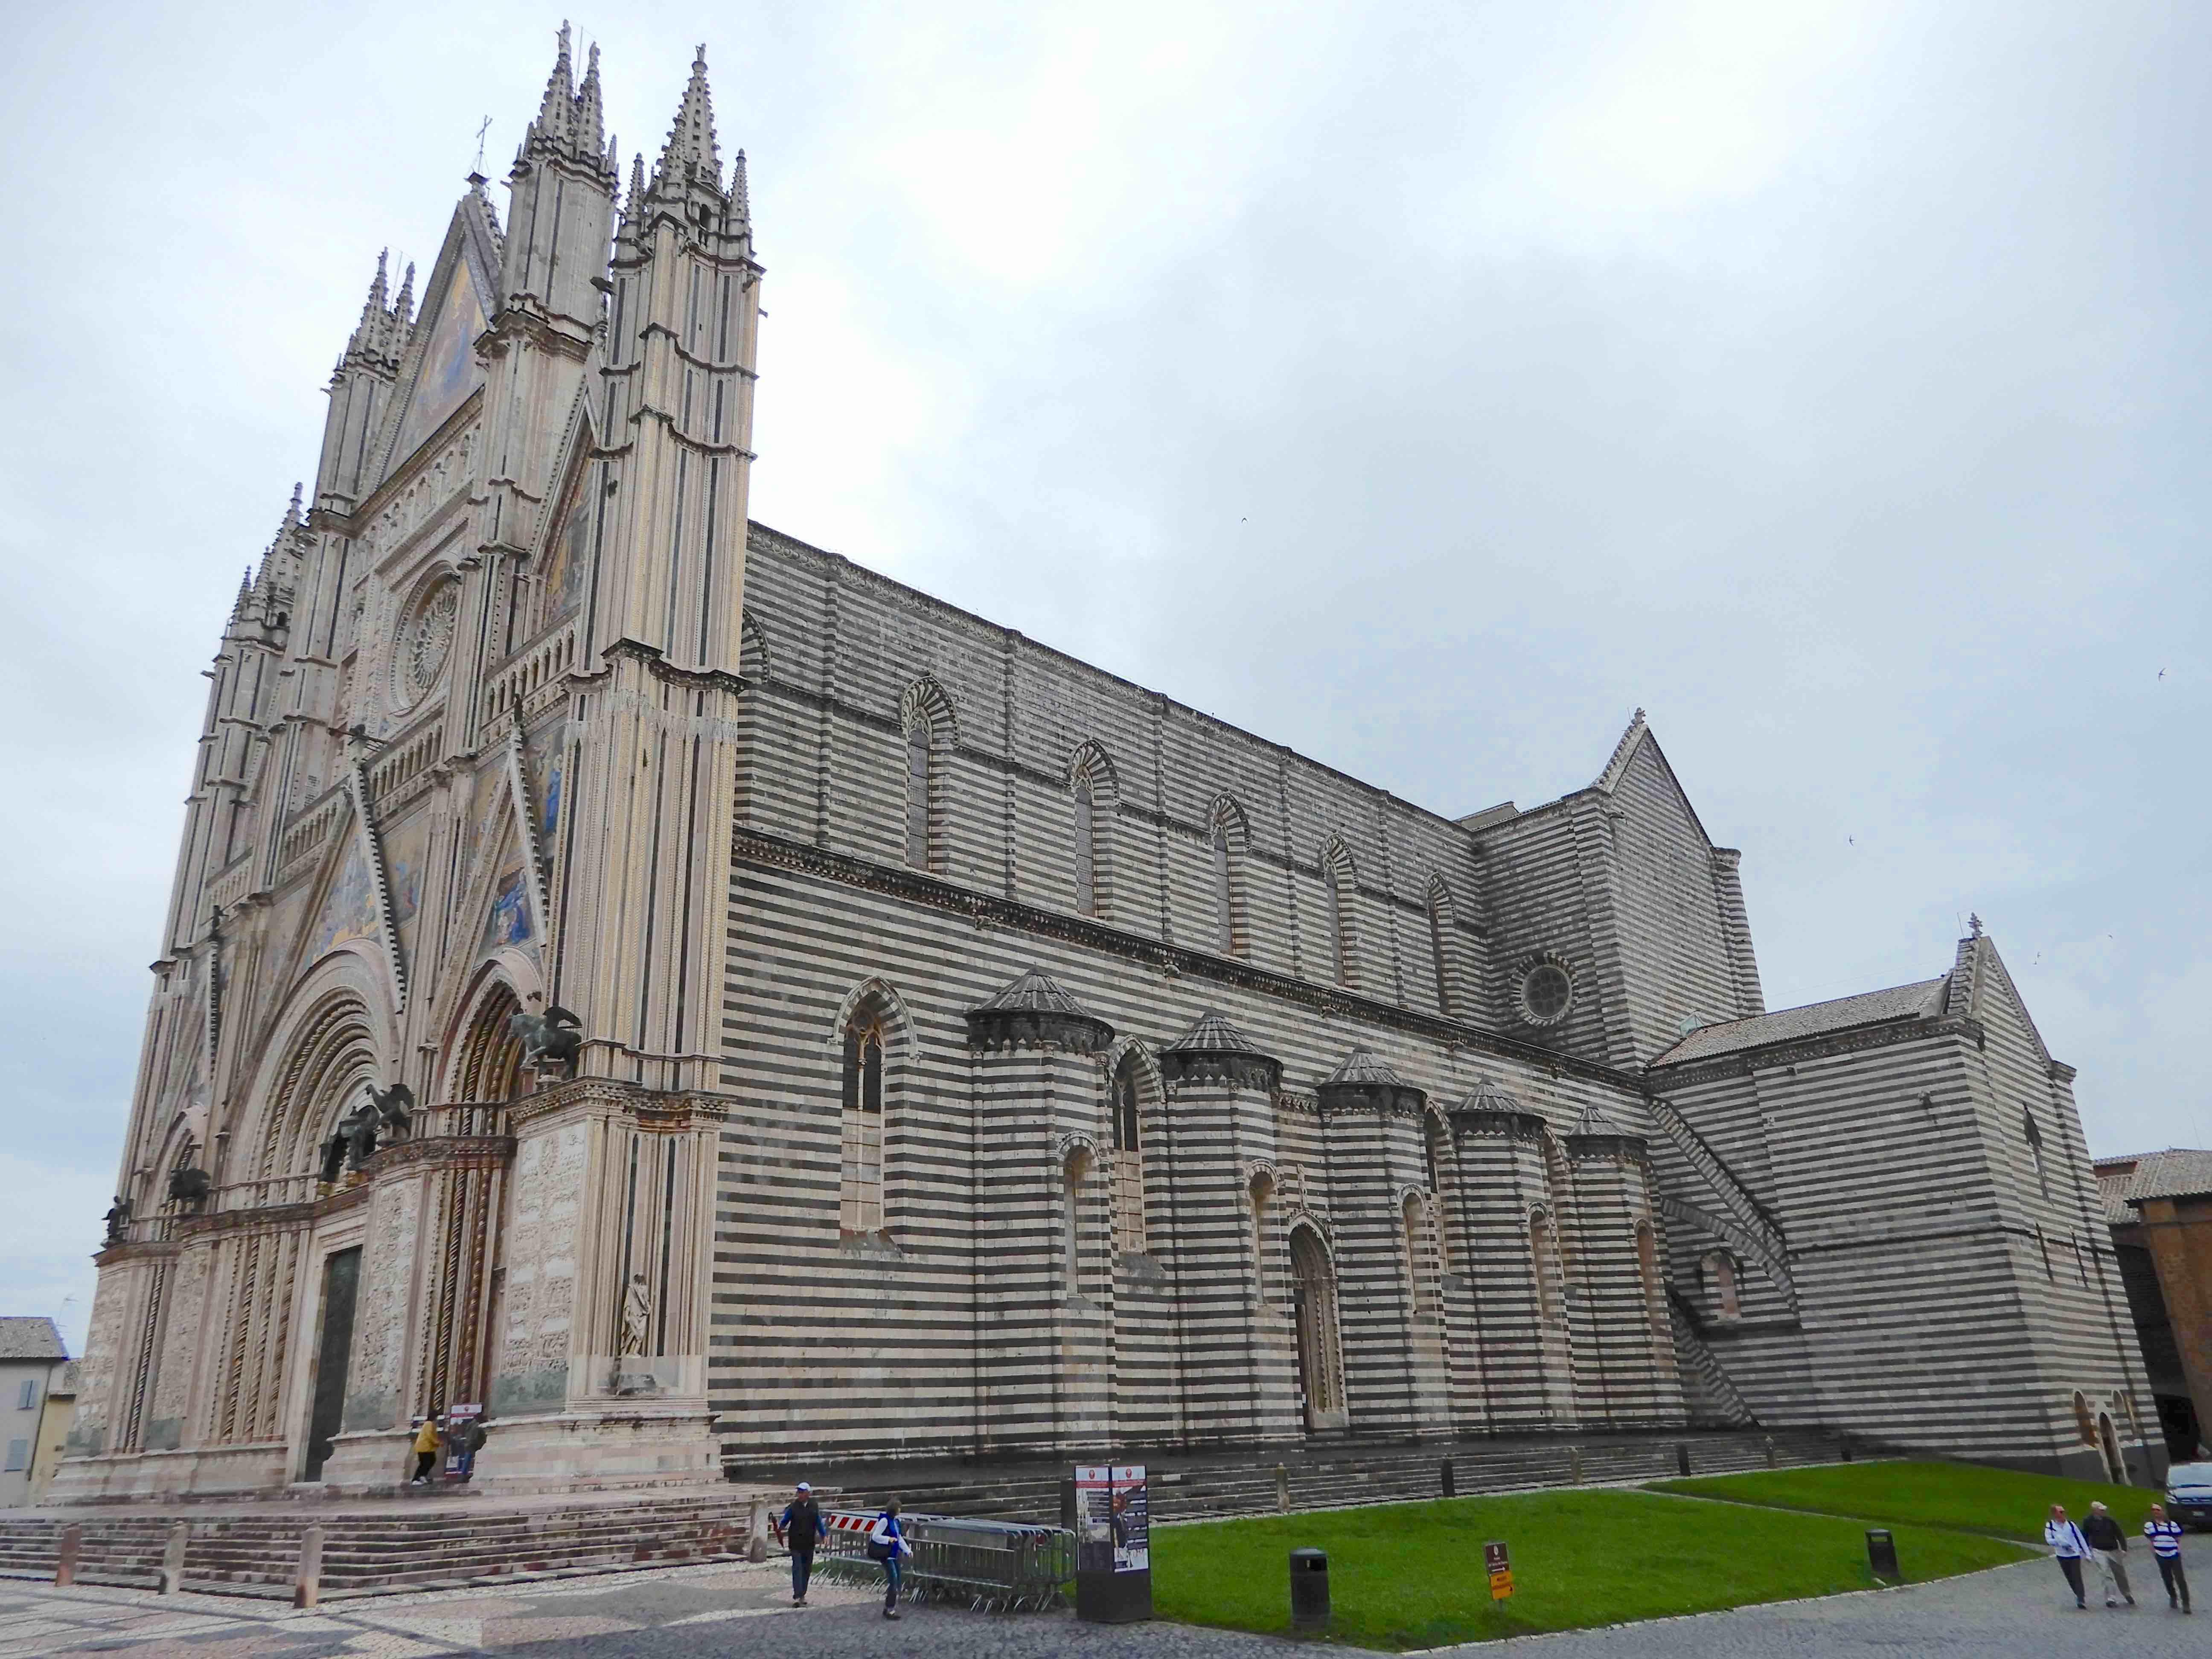 2.Duomo di Orvieto